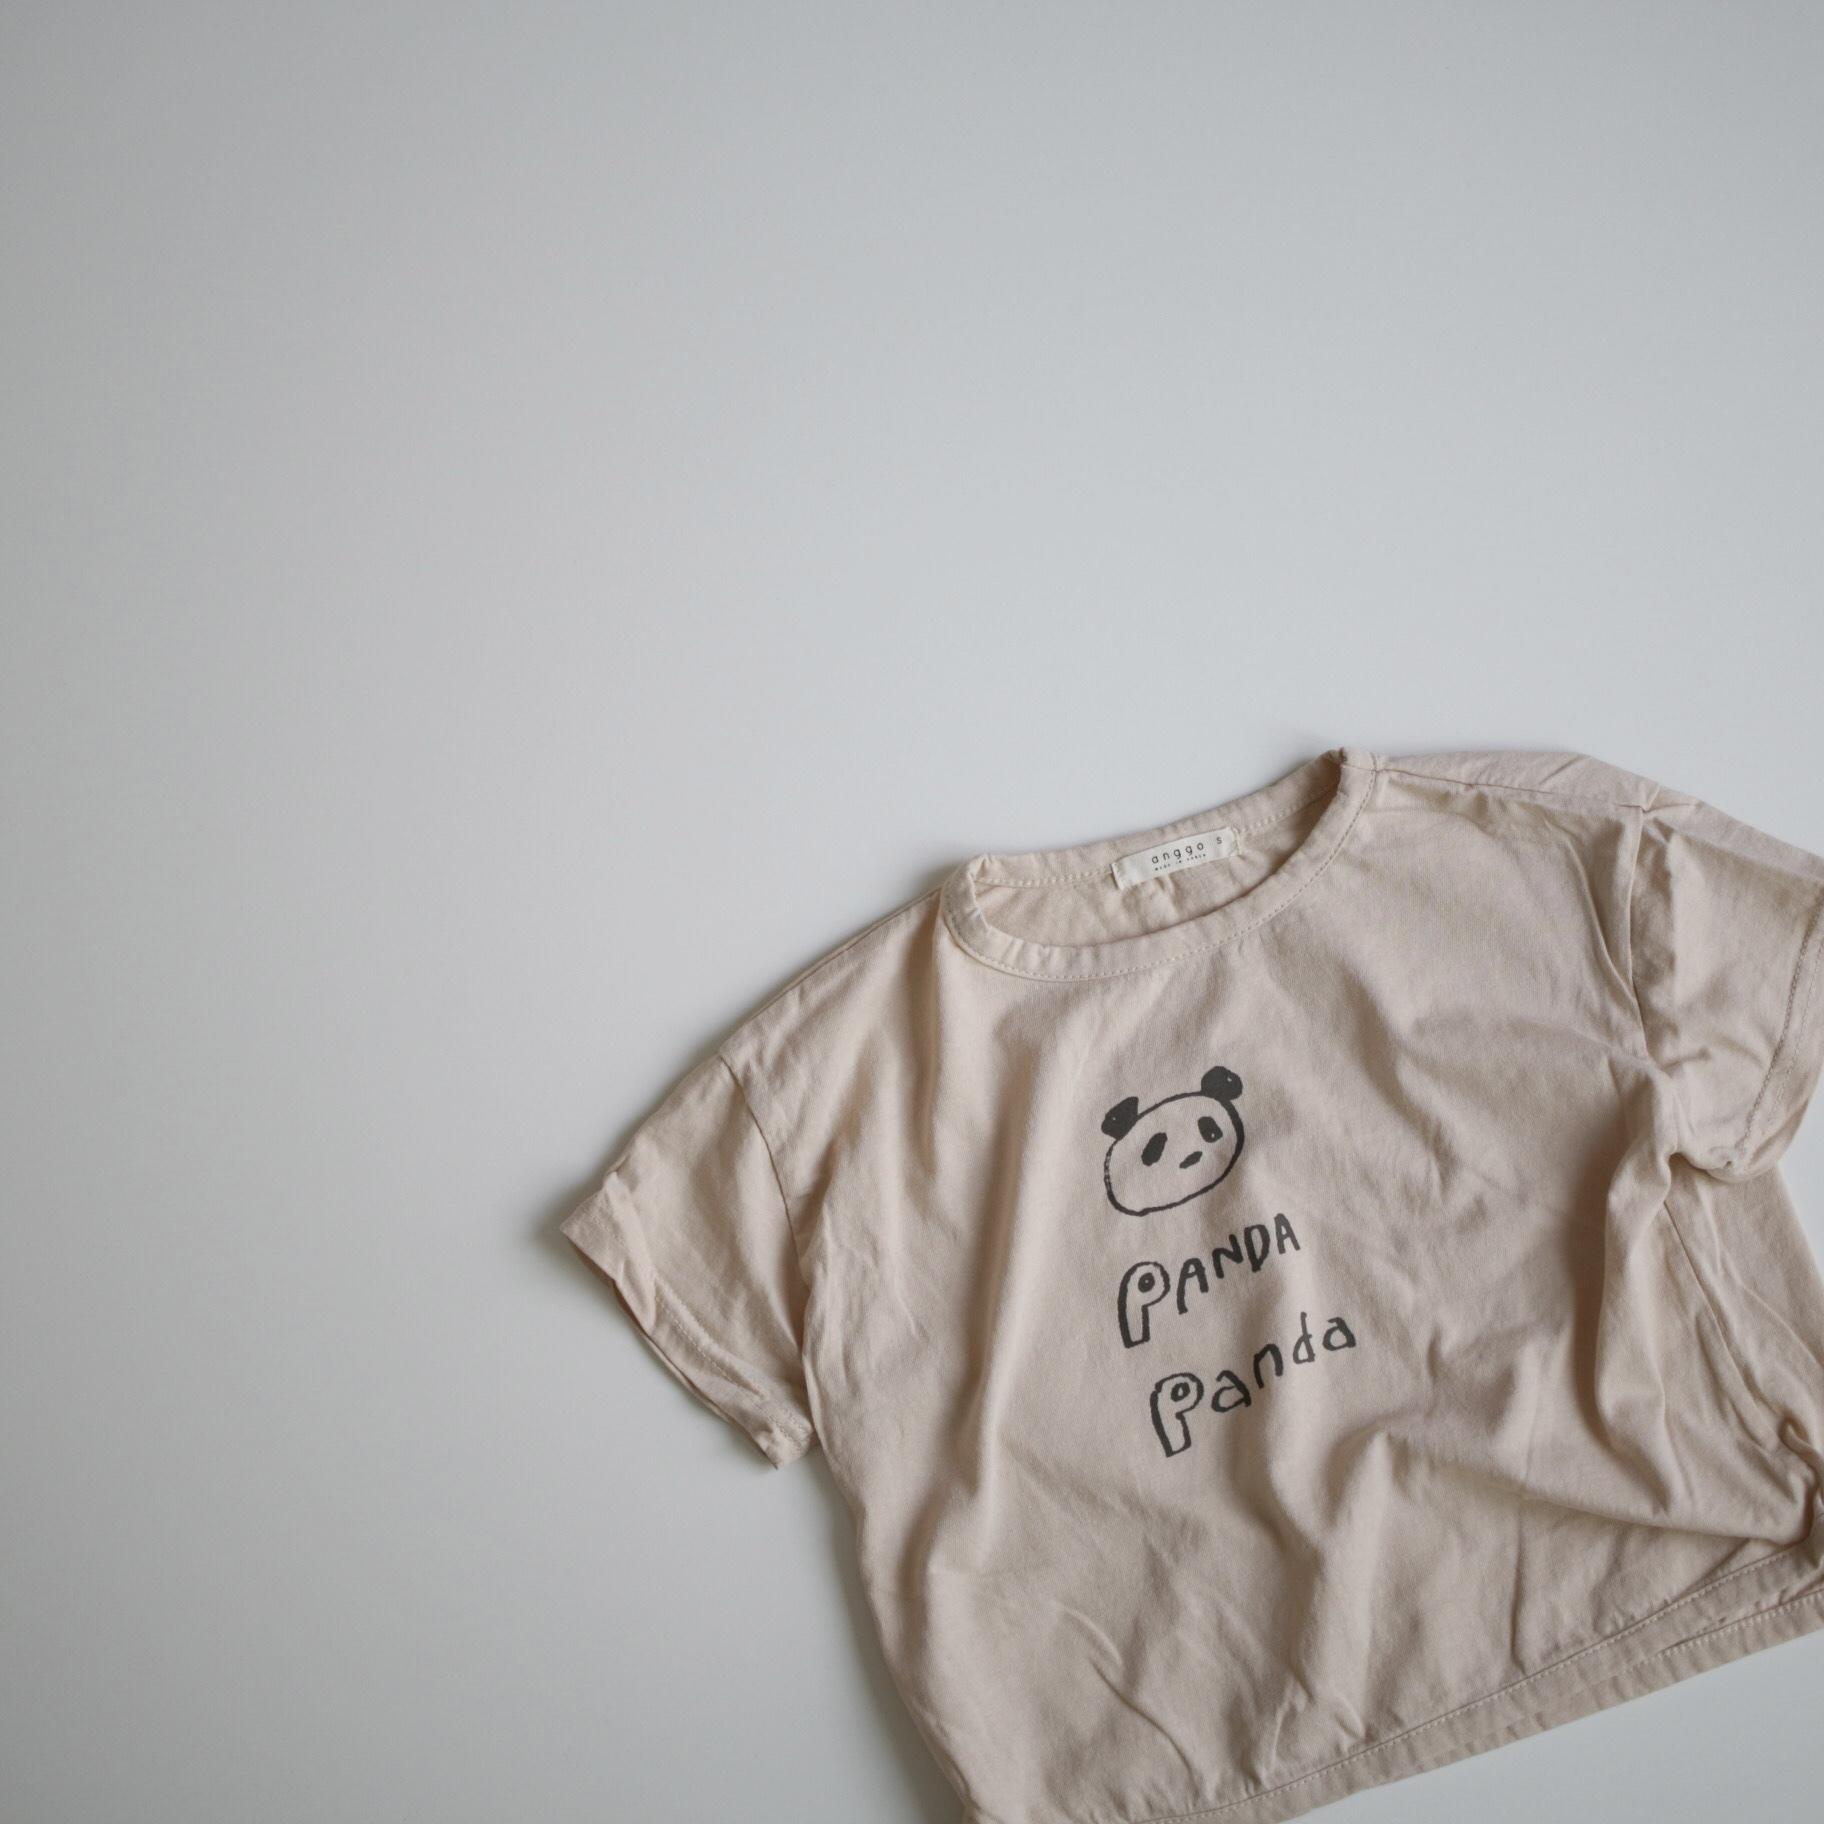 papa panda   T.  〔パパ パンダ T 〕